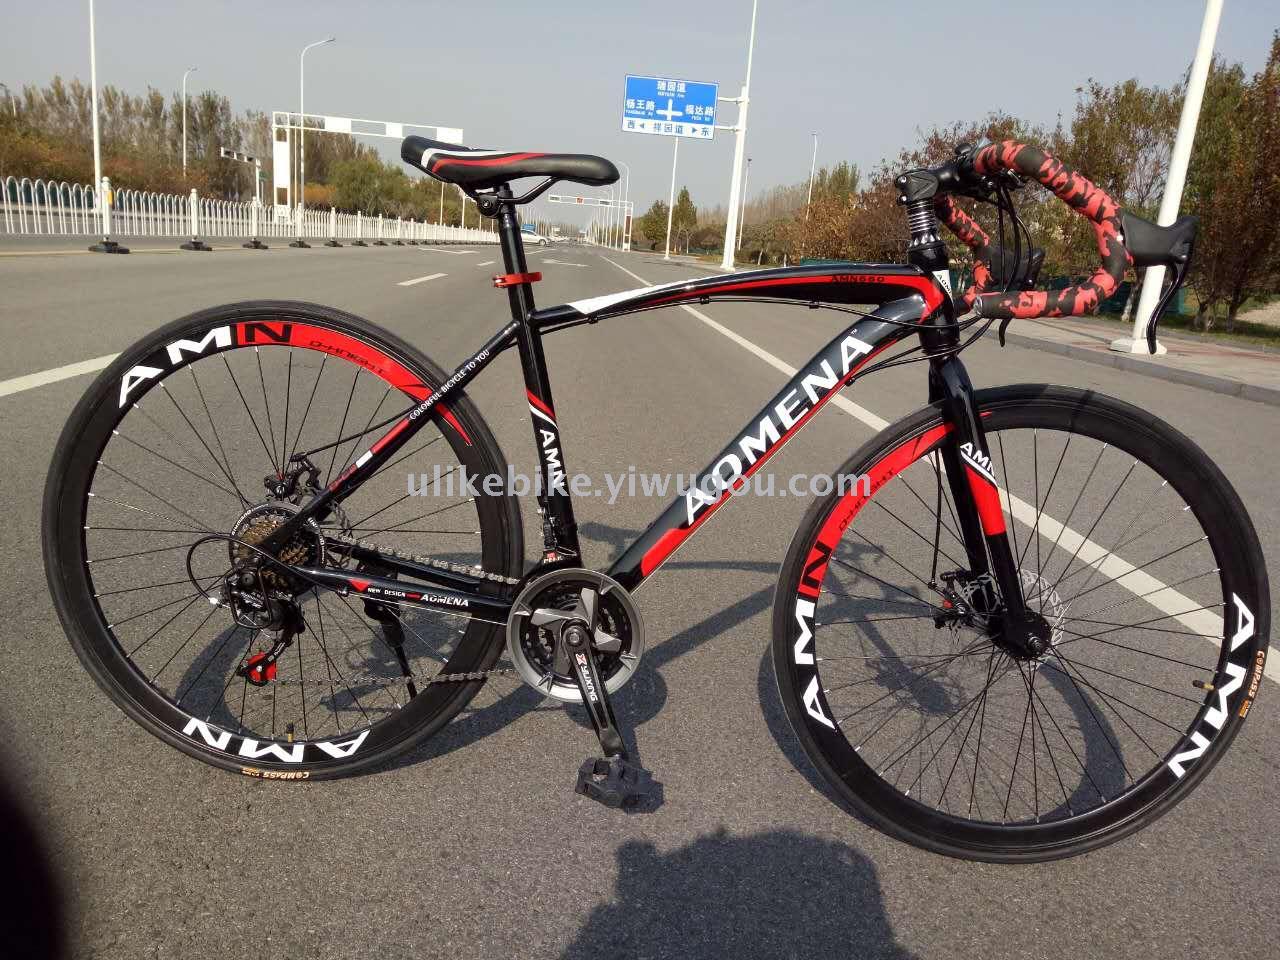 Supply Bike 700c road car 26 \\\